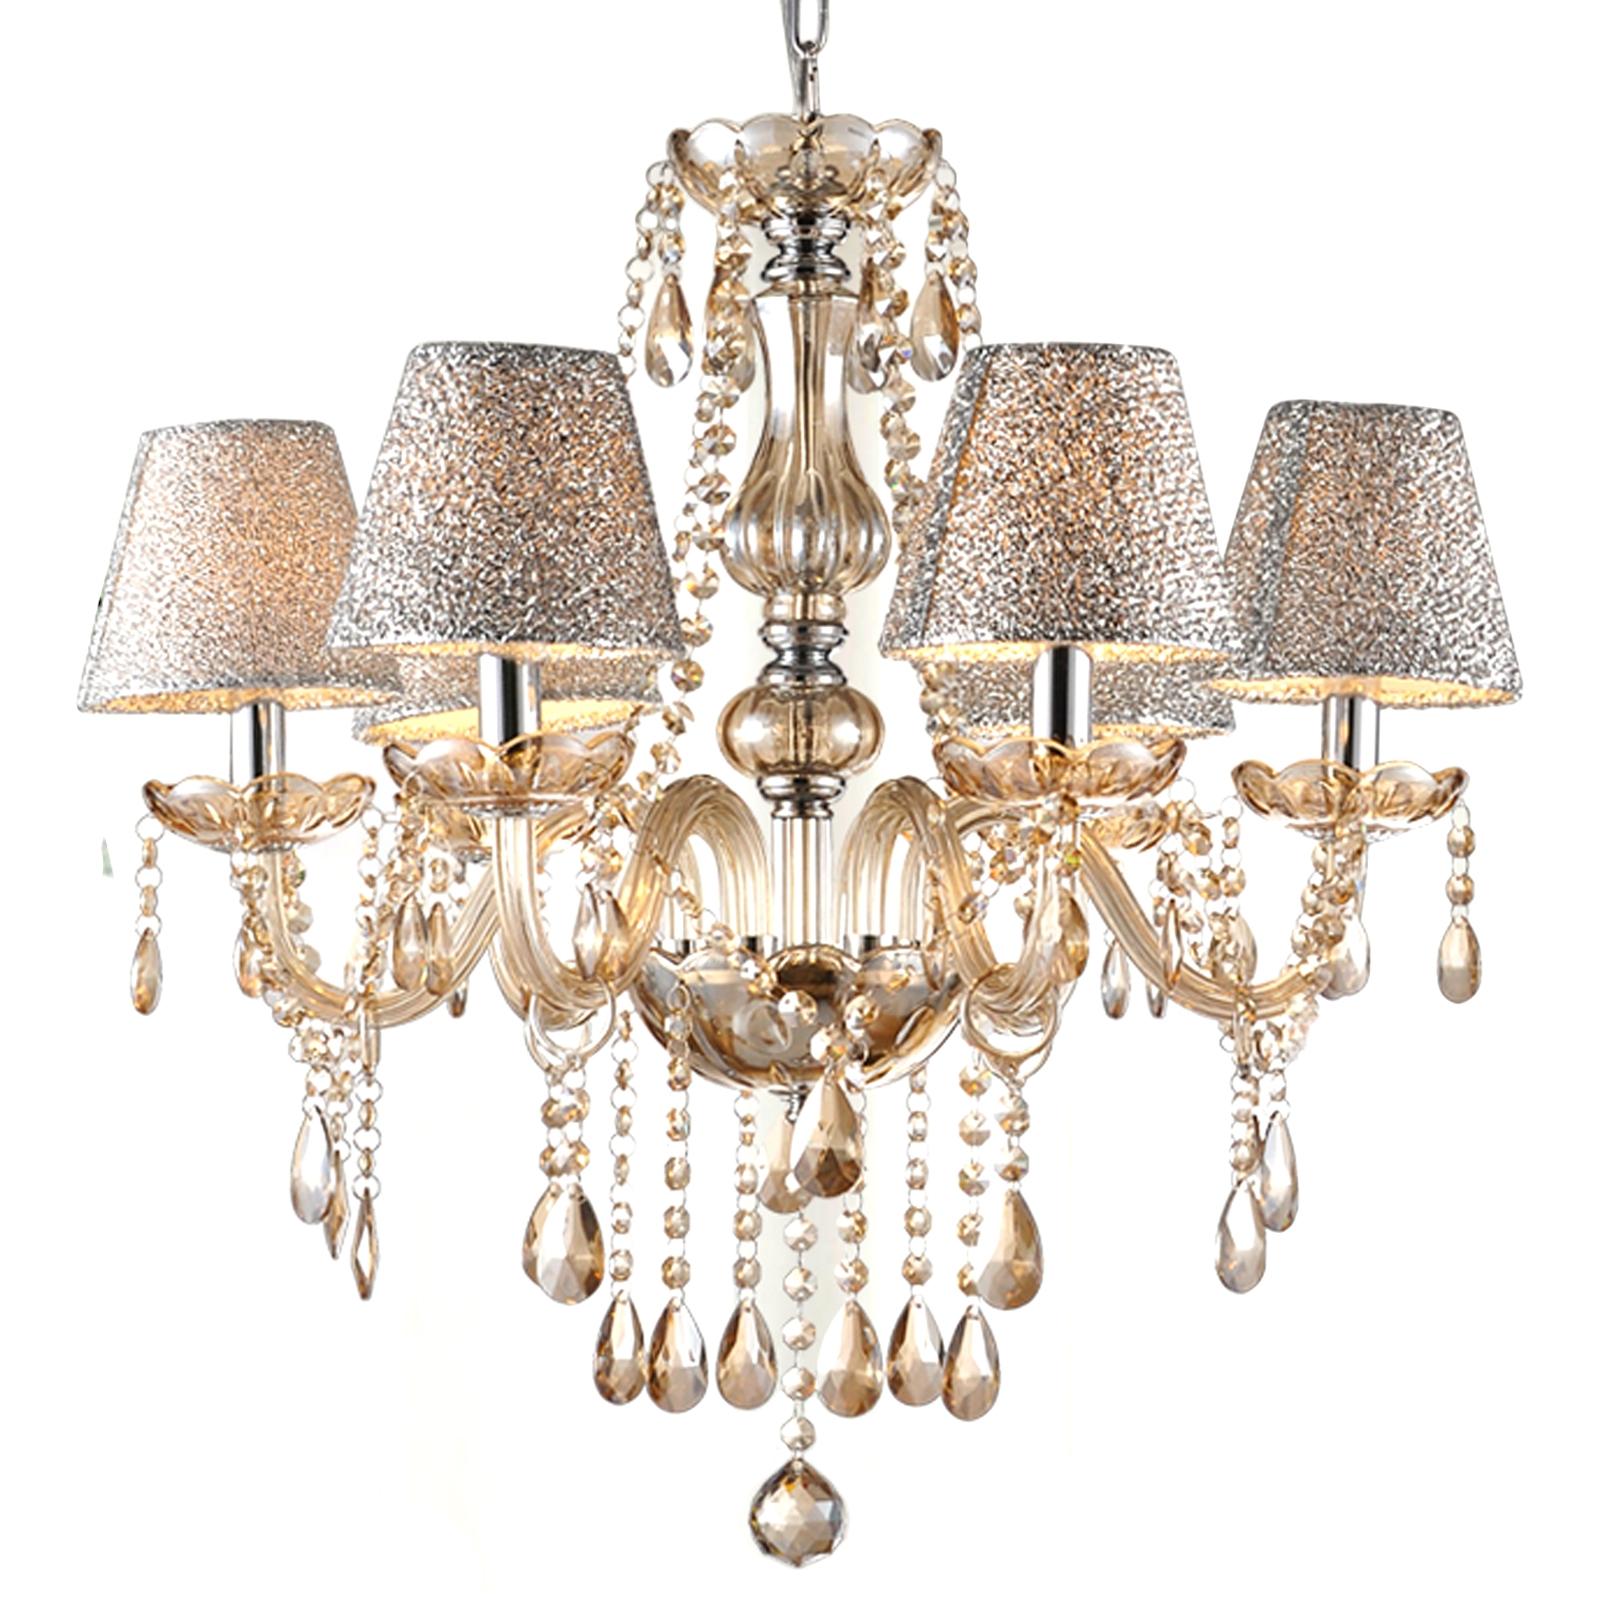 Crystal Lamp Chandelier Ceiling Chain Lamp 6 Lights smt